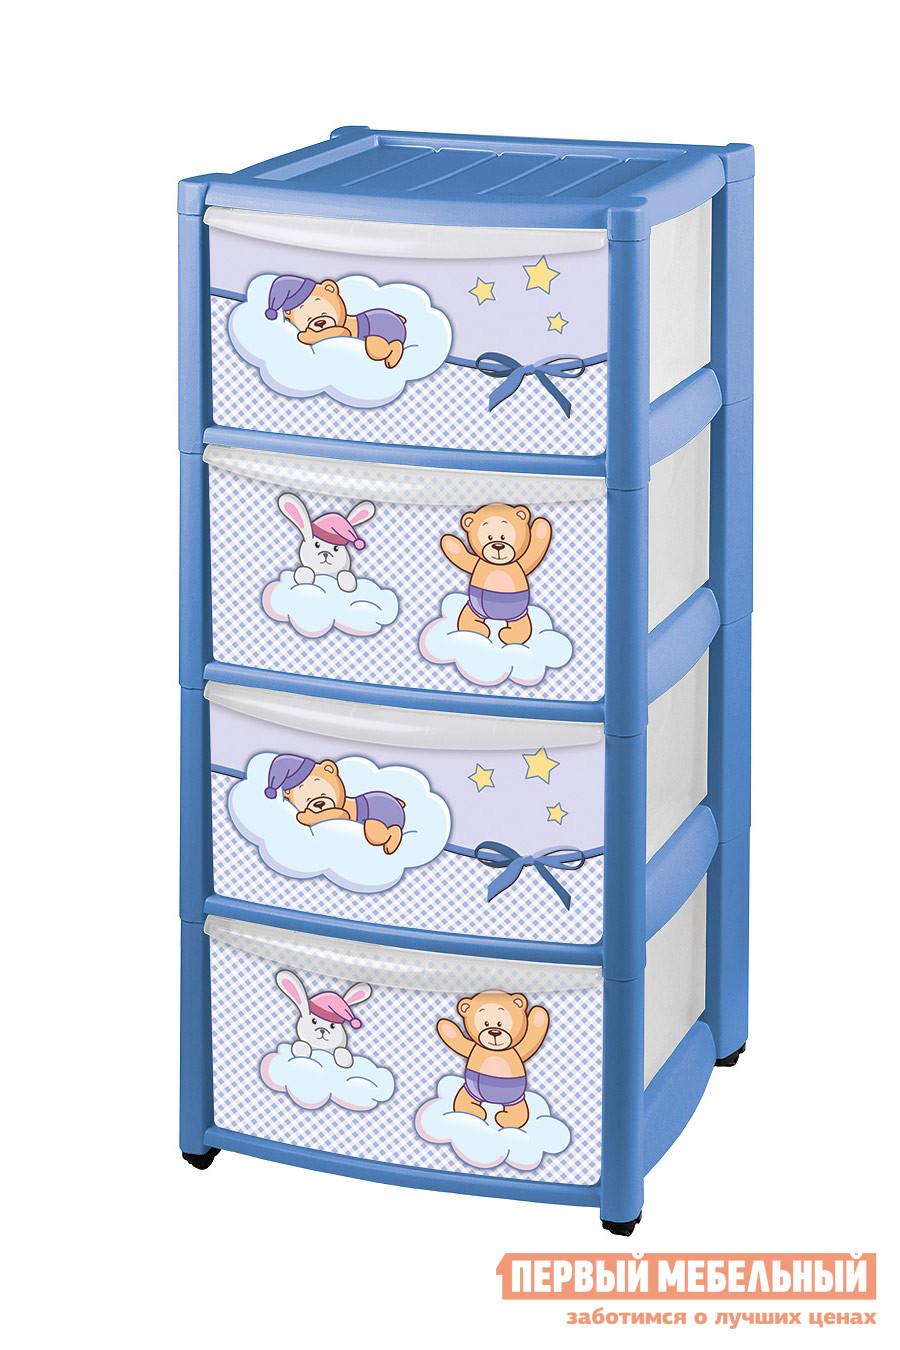 Комод детский Пластишка 4313870 Синий